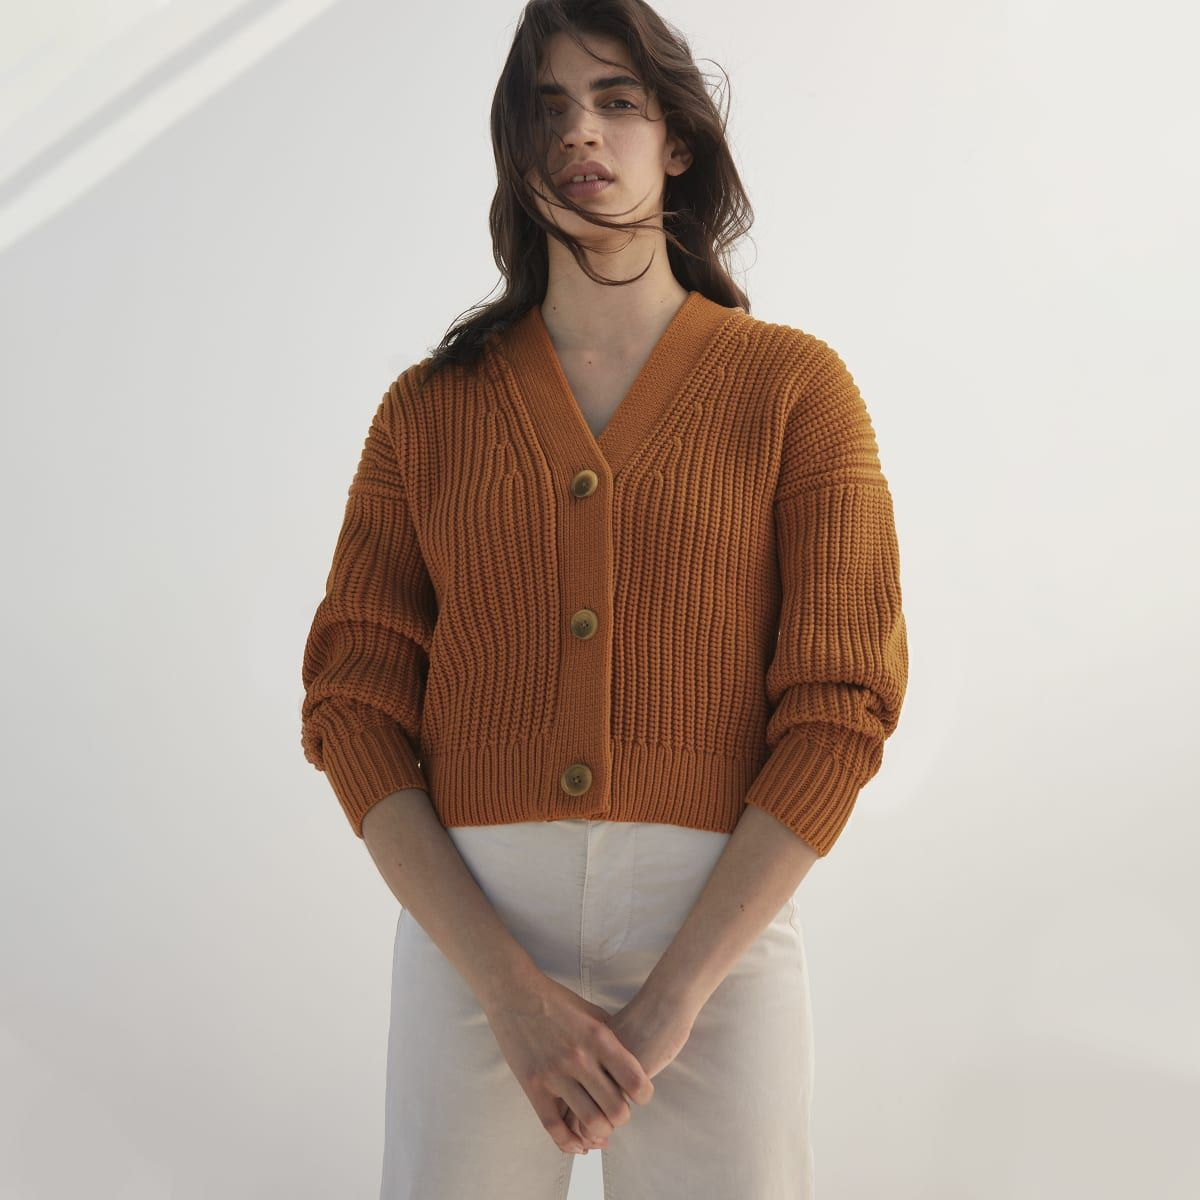 The Texture Cotton Crop Cardigan